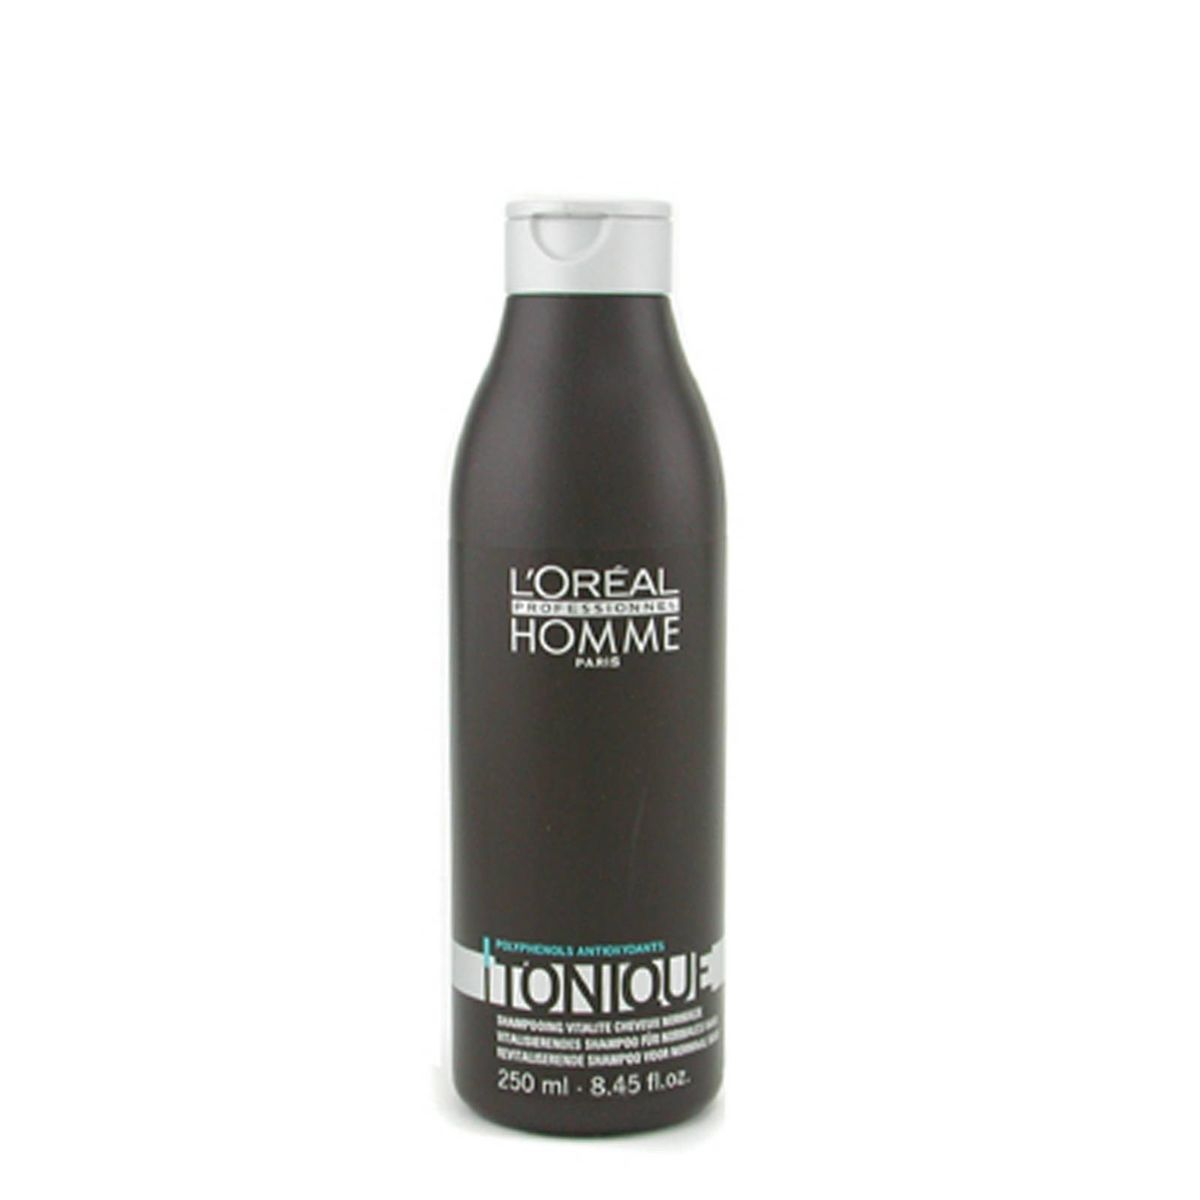 Loreal Homme Tonique  Shampoo Masculino - 250ml